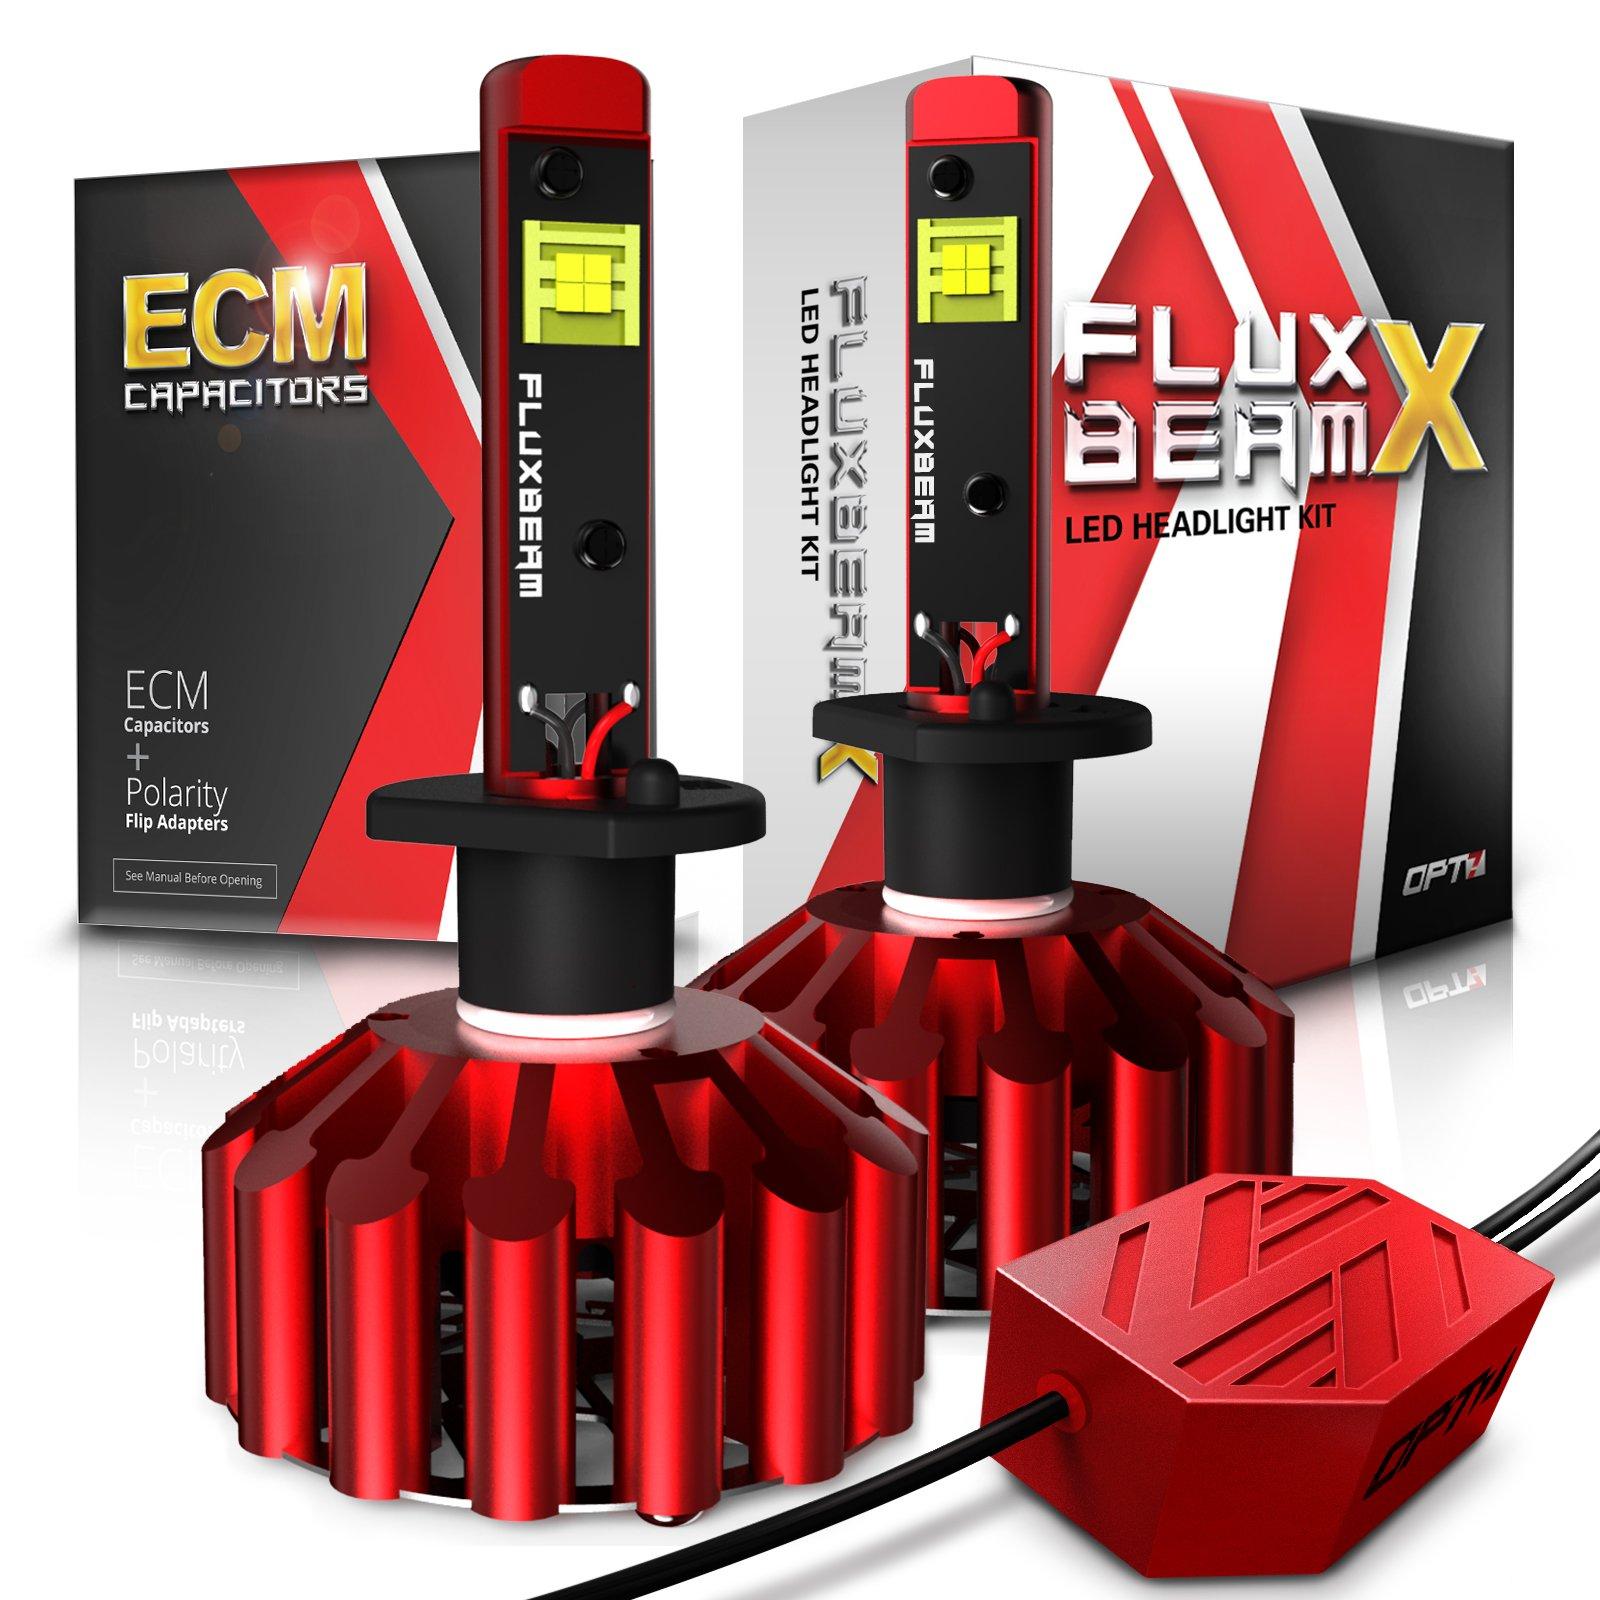 OPT7 Fluxbeam X H1 LED Headlight Bulbs - 8,400Lm 6,000K Daytime White - All Bulb Sizes - 60w - 2 Year Warranty